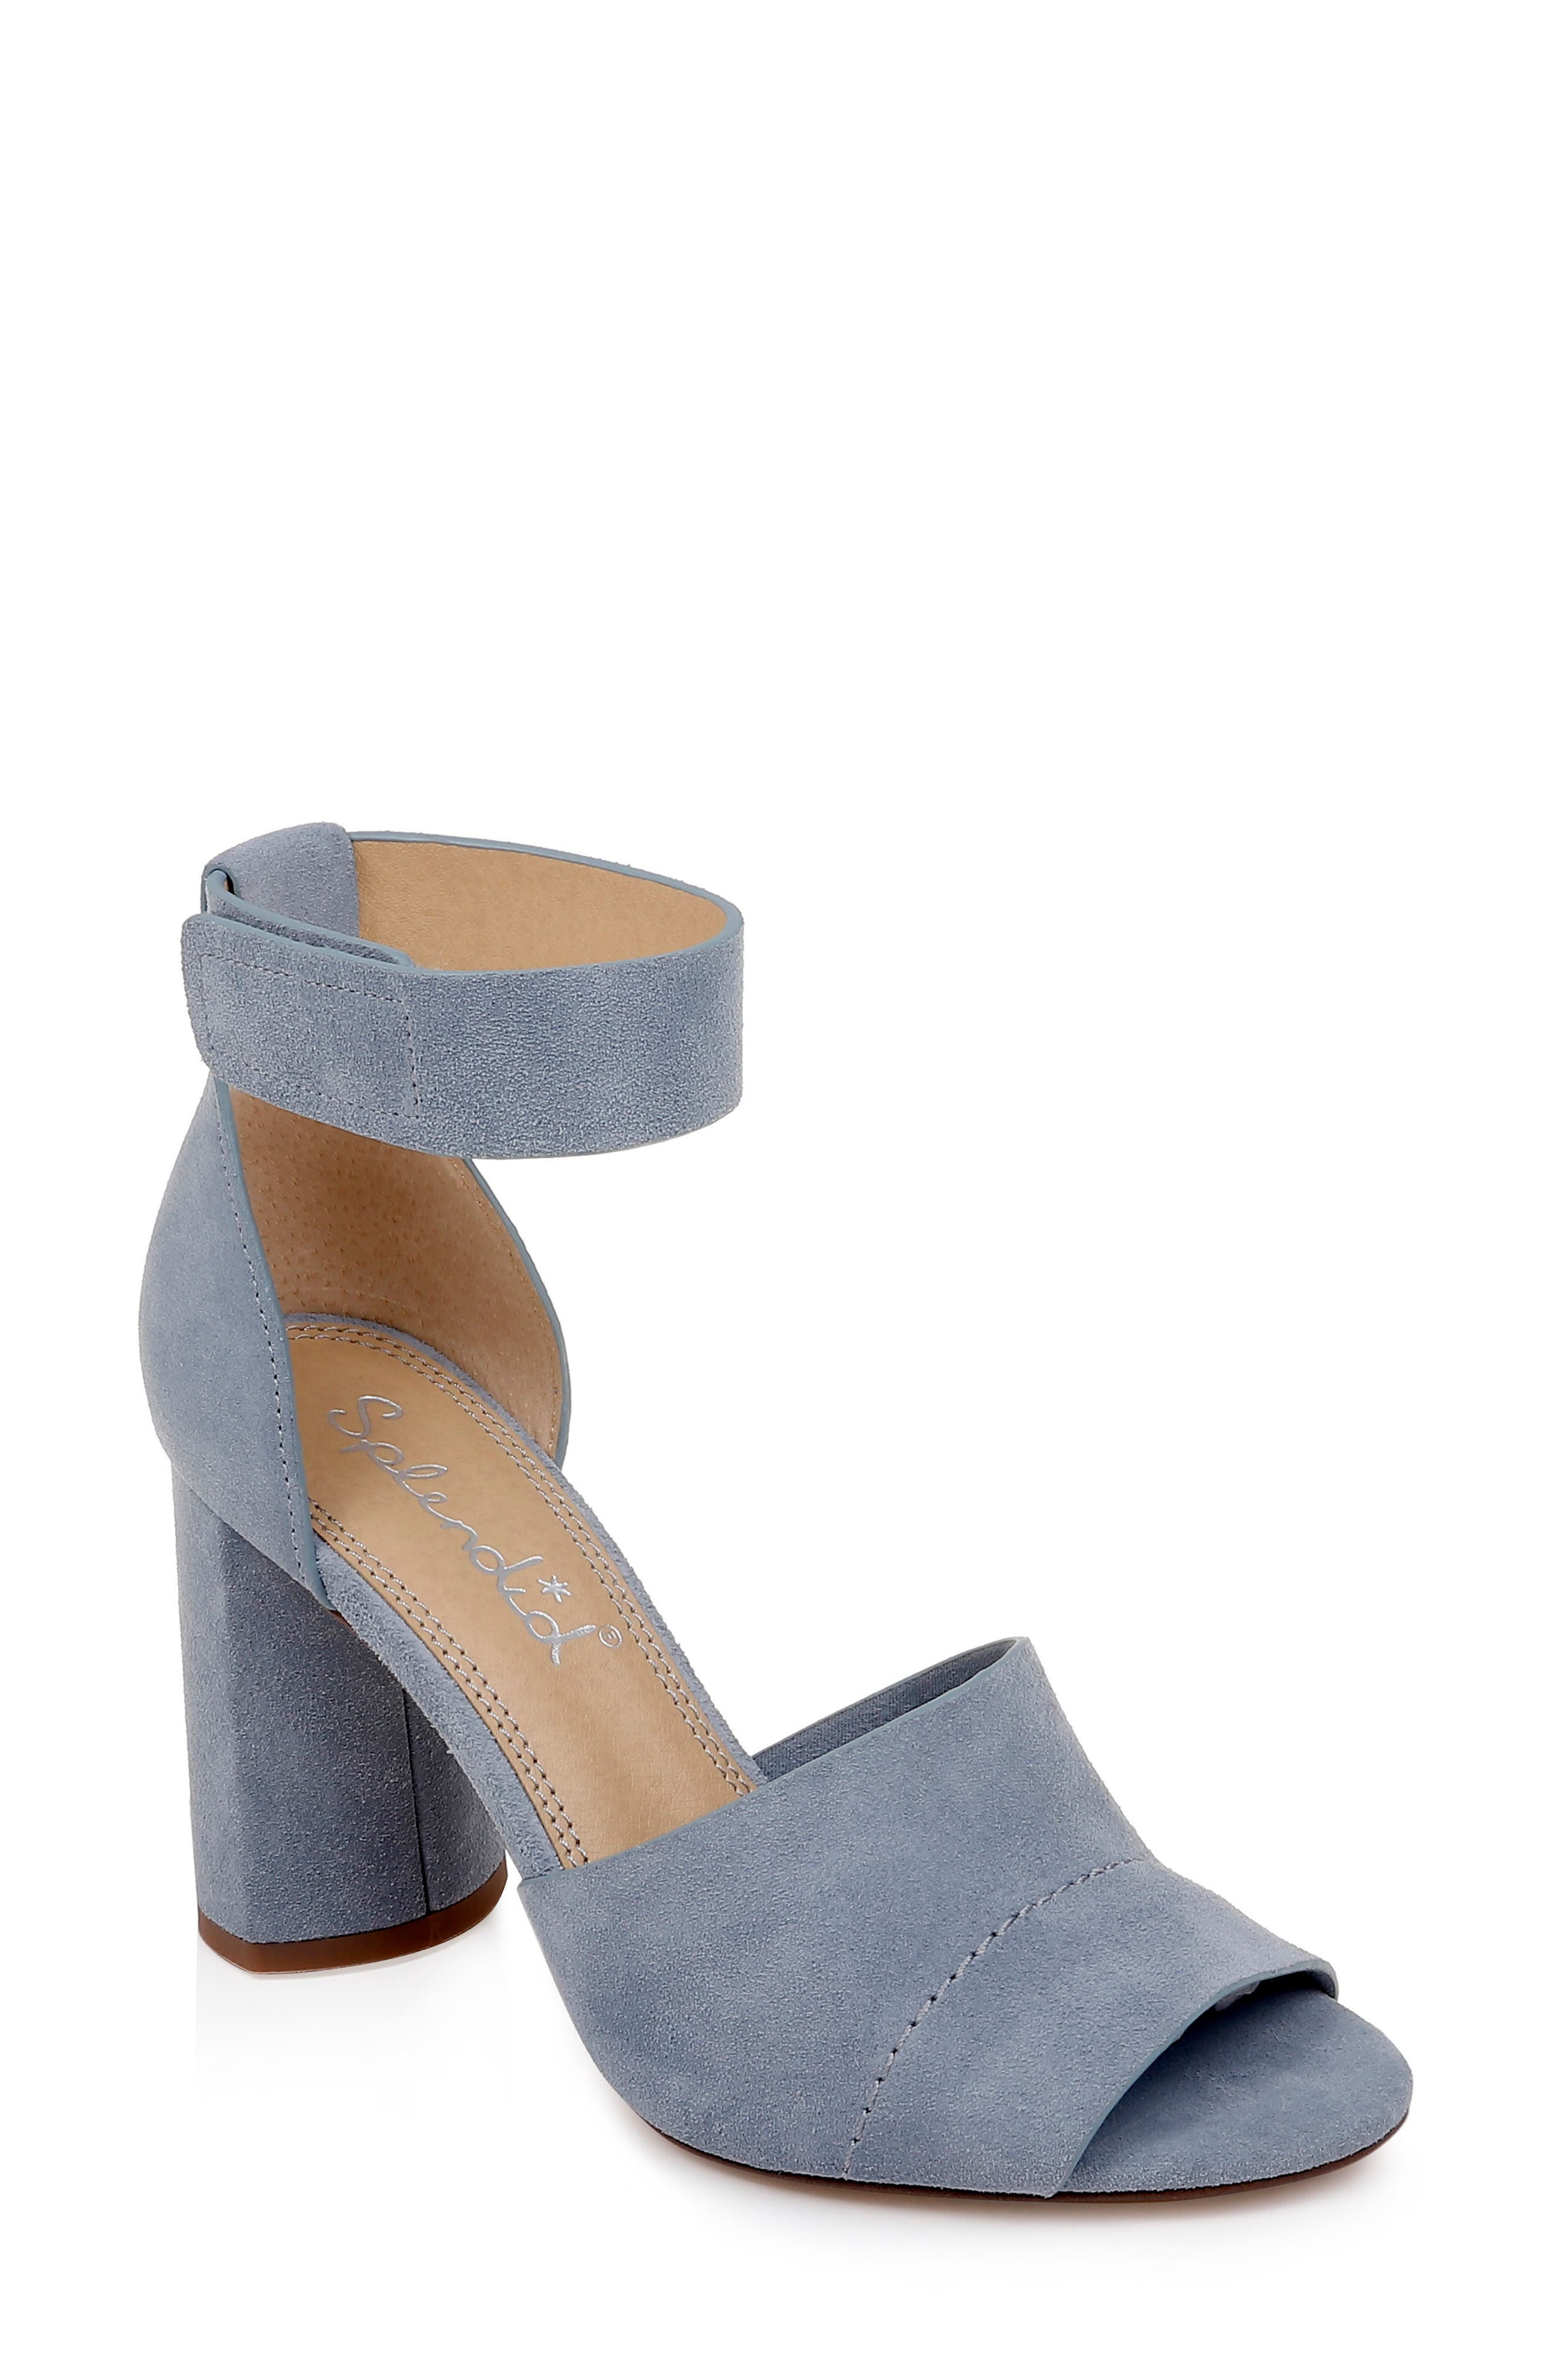 Splendid Thandie Ankle Strap Sandal, Blue